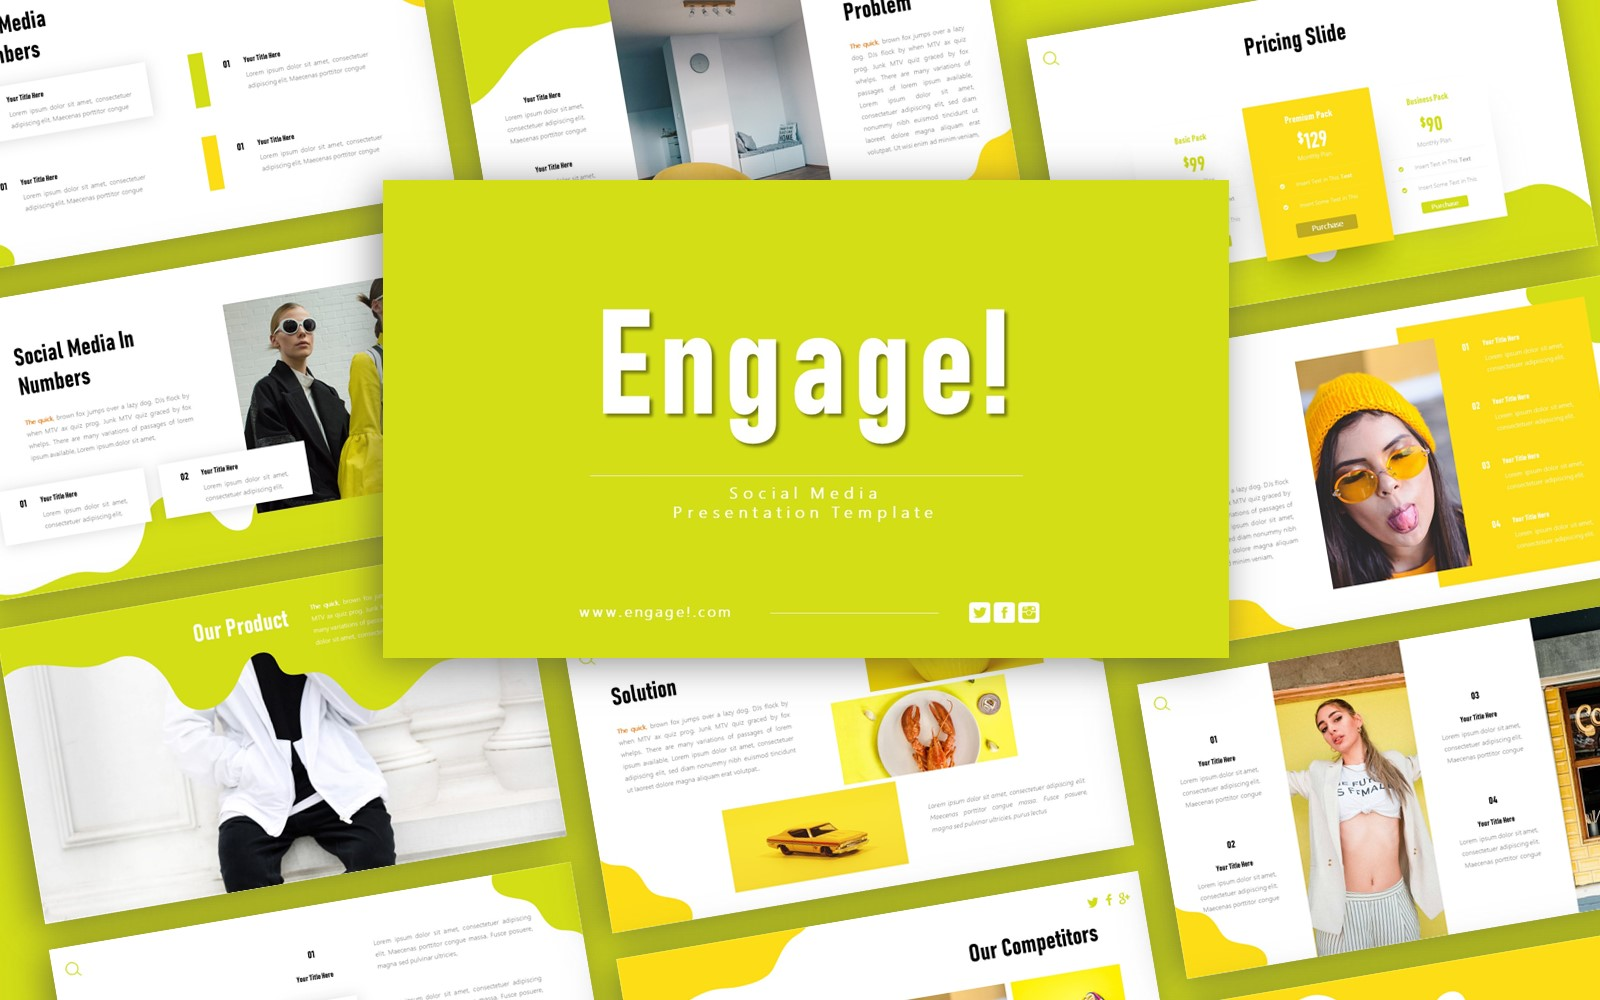 Engage Social Media Presentation PowerPoint sablon 125948